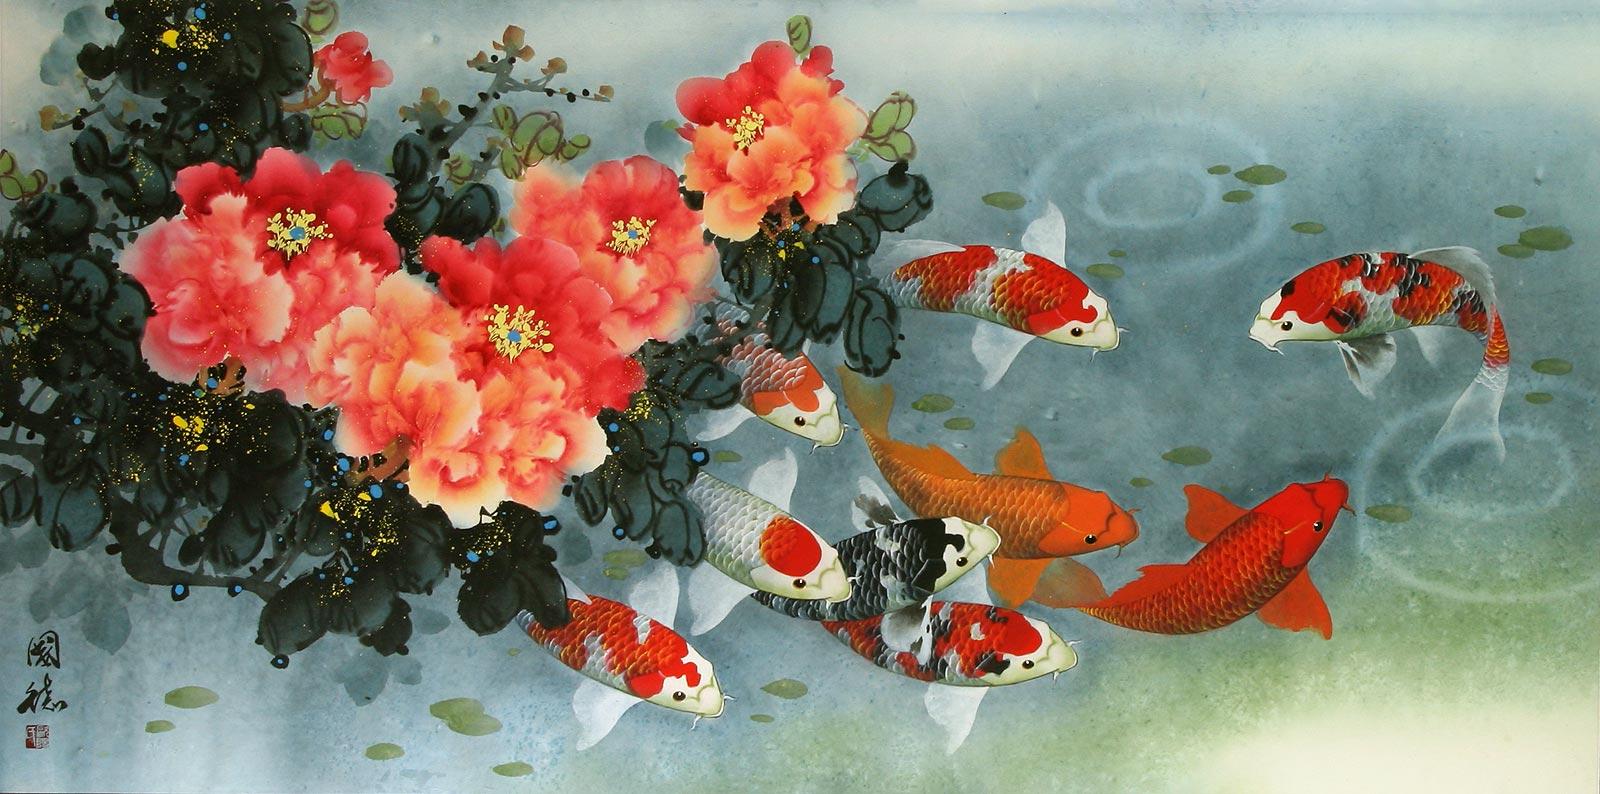 Koi Fish and Peony Painting - Asian Koi Fish Paintings & Wall ...